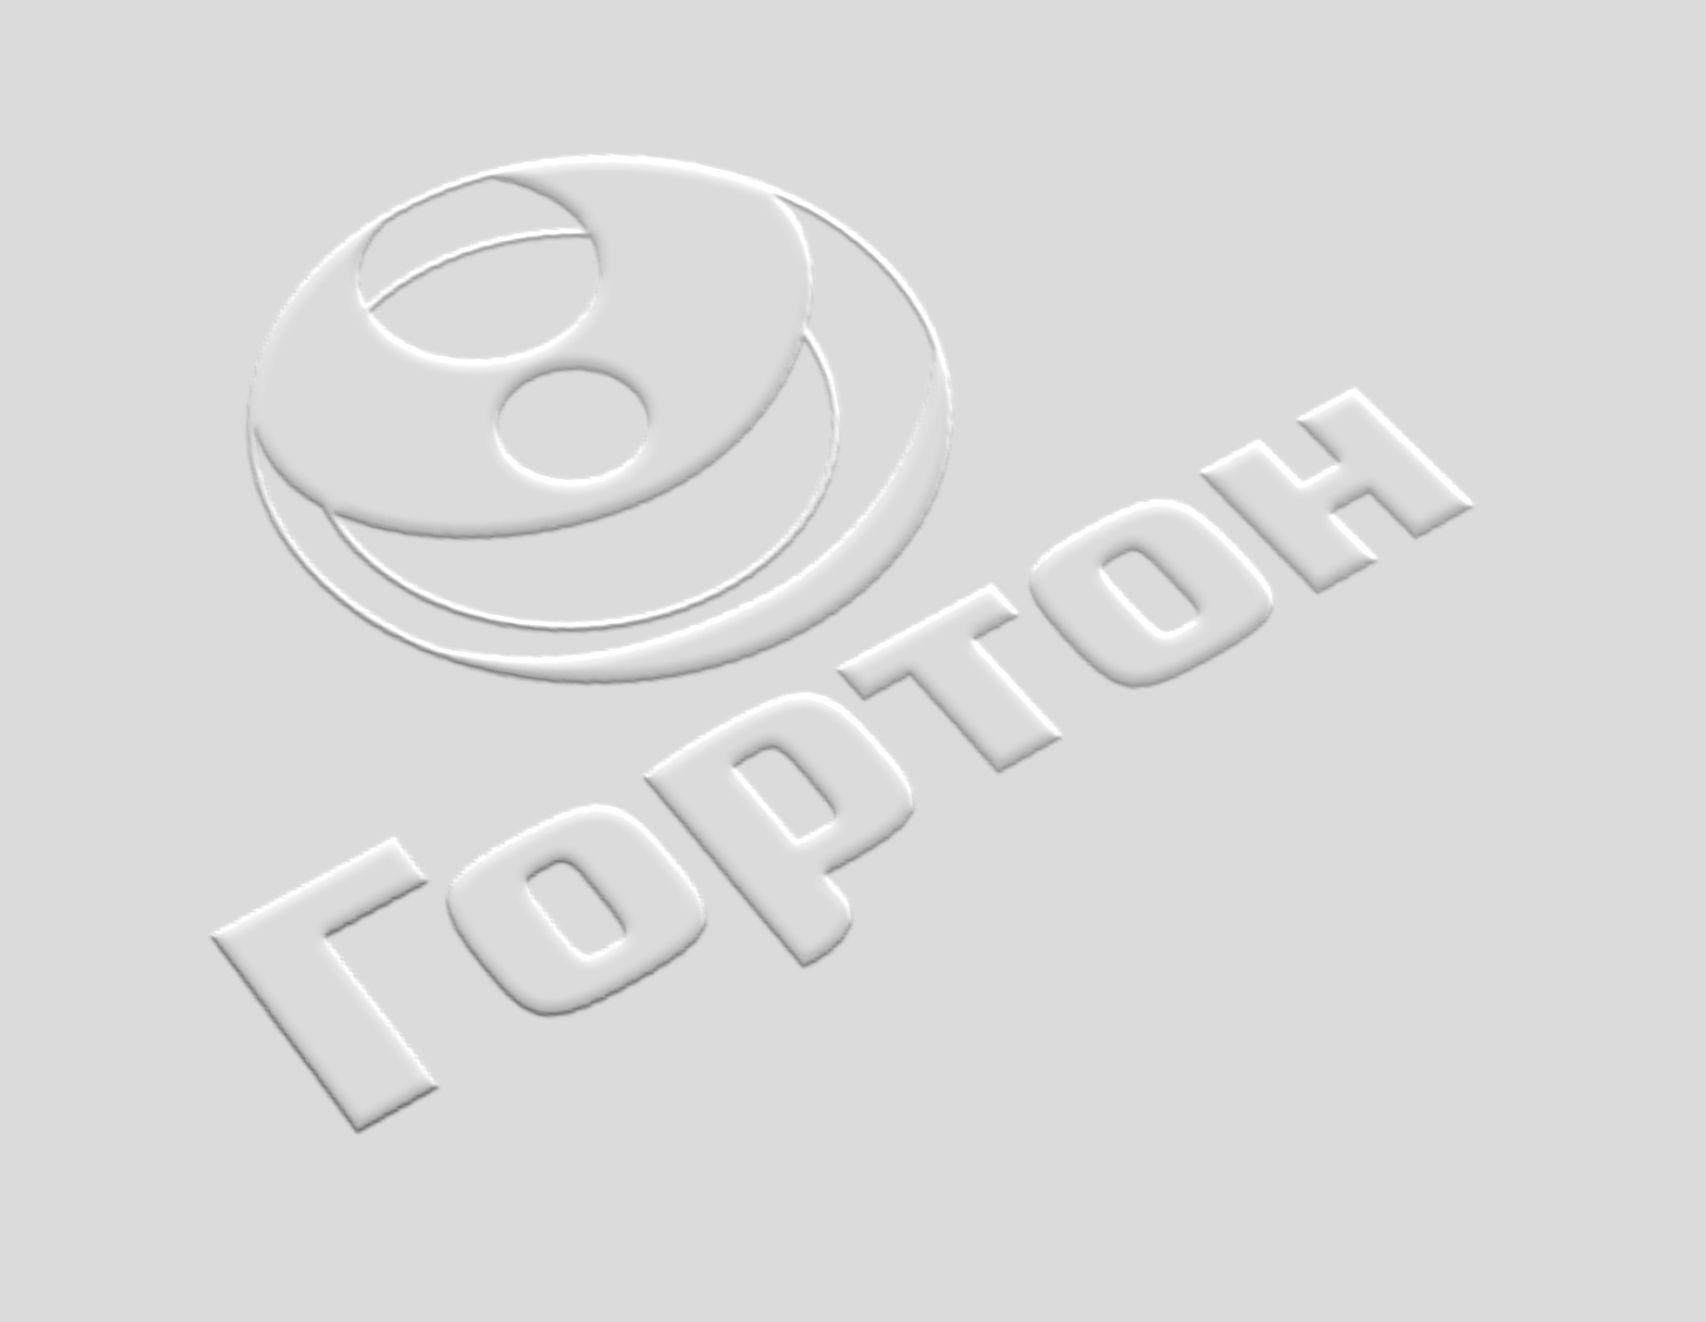 Гортон - дизайнер zhutol